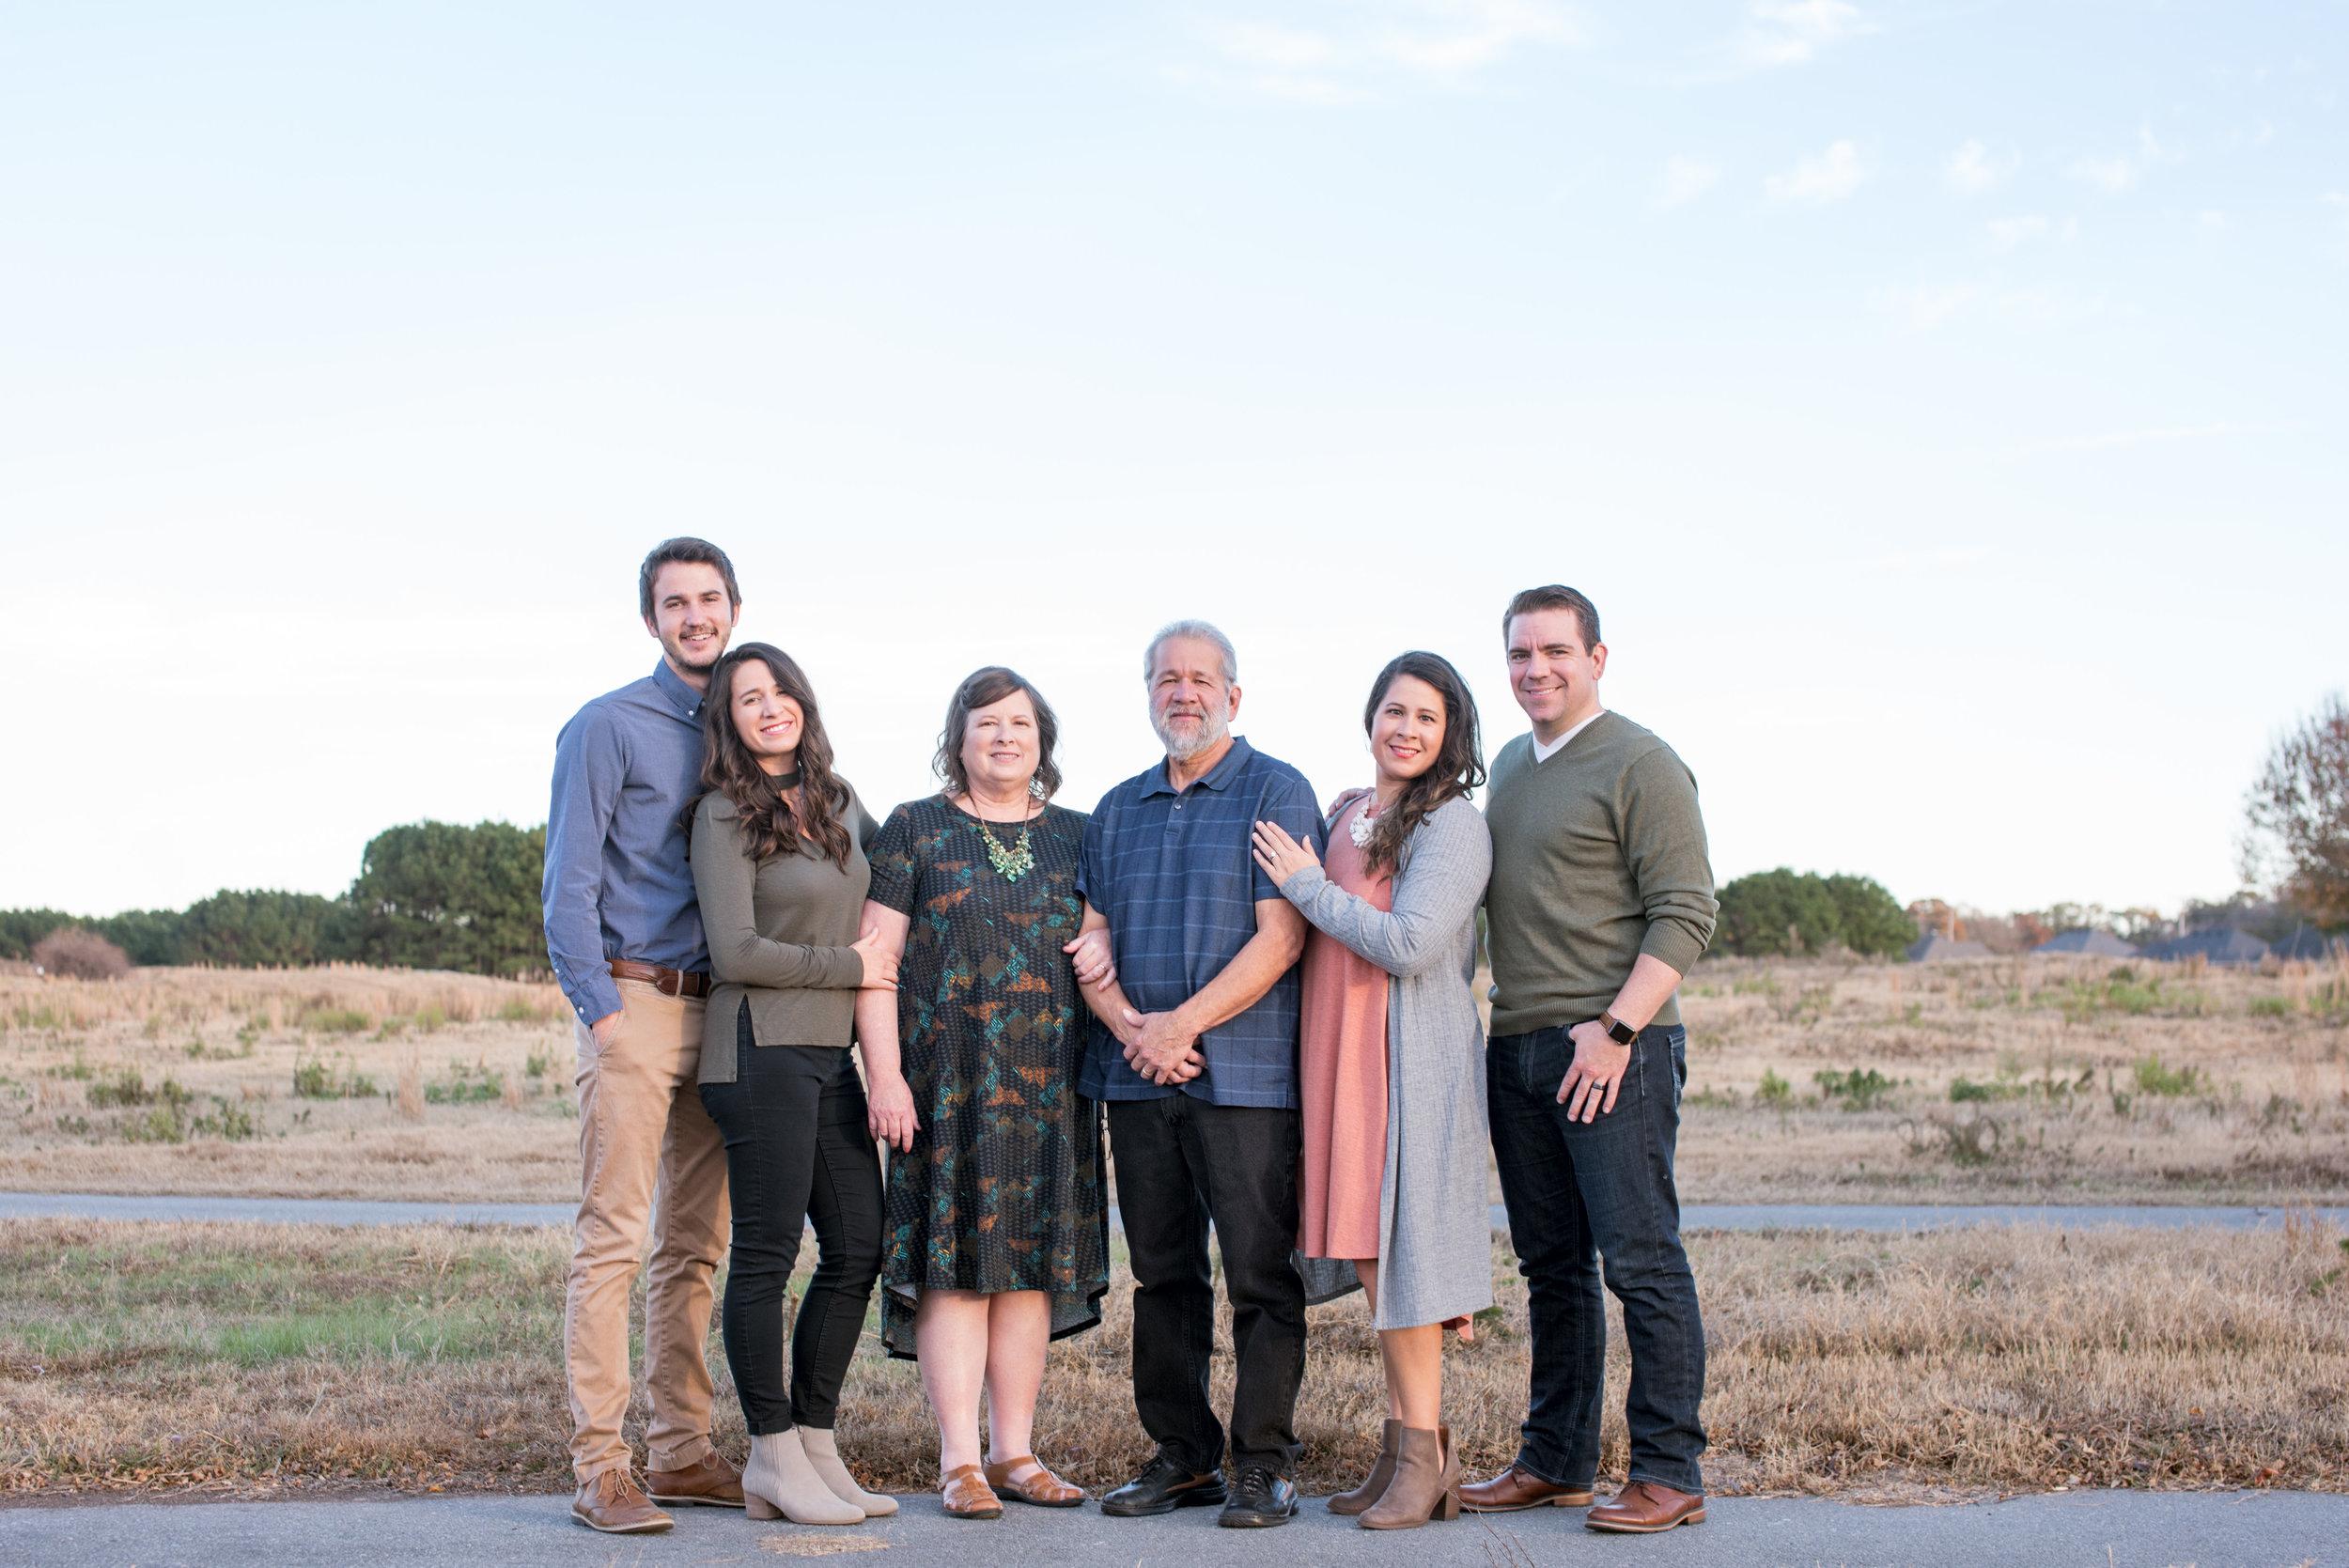 mmilesfamily-16.jpg